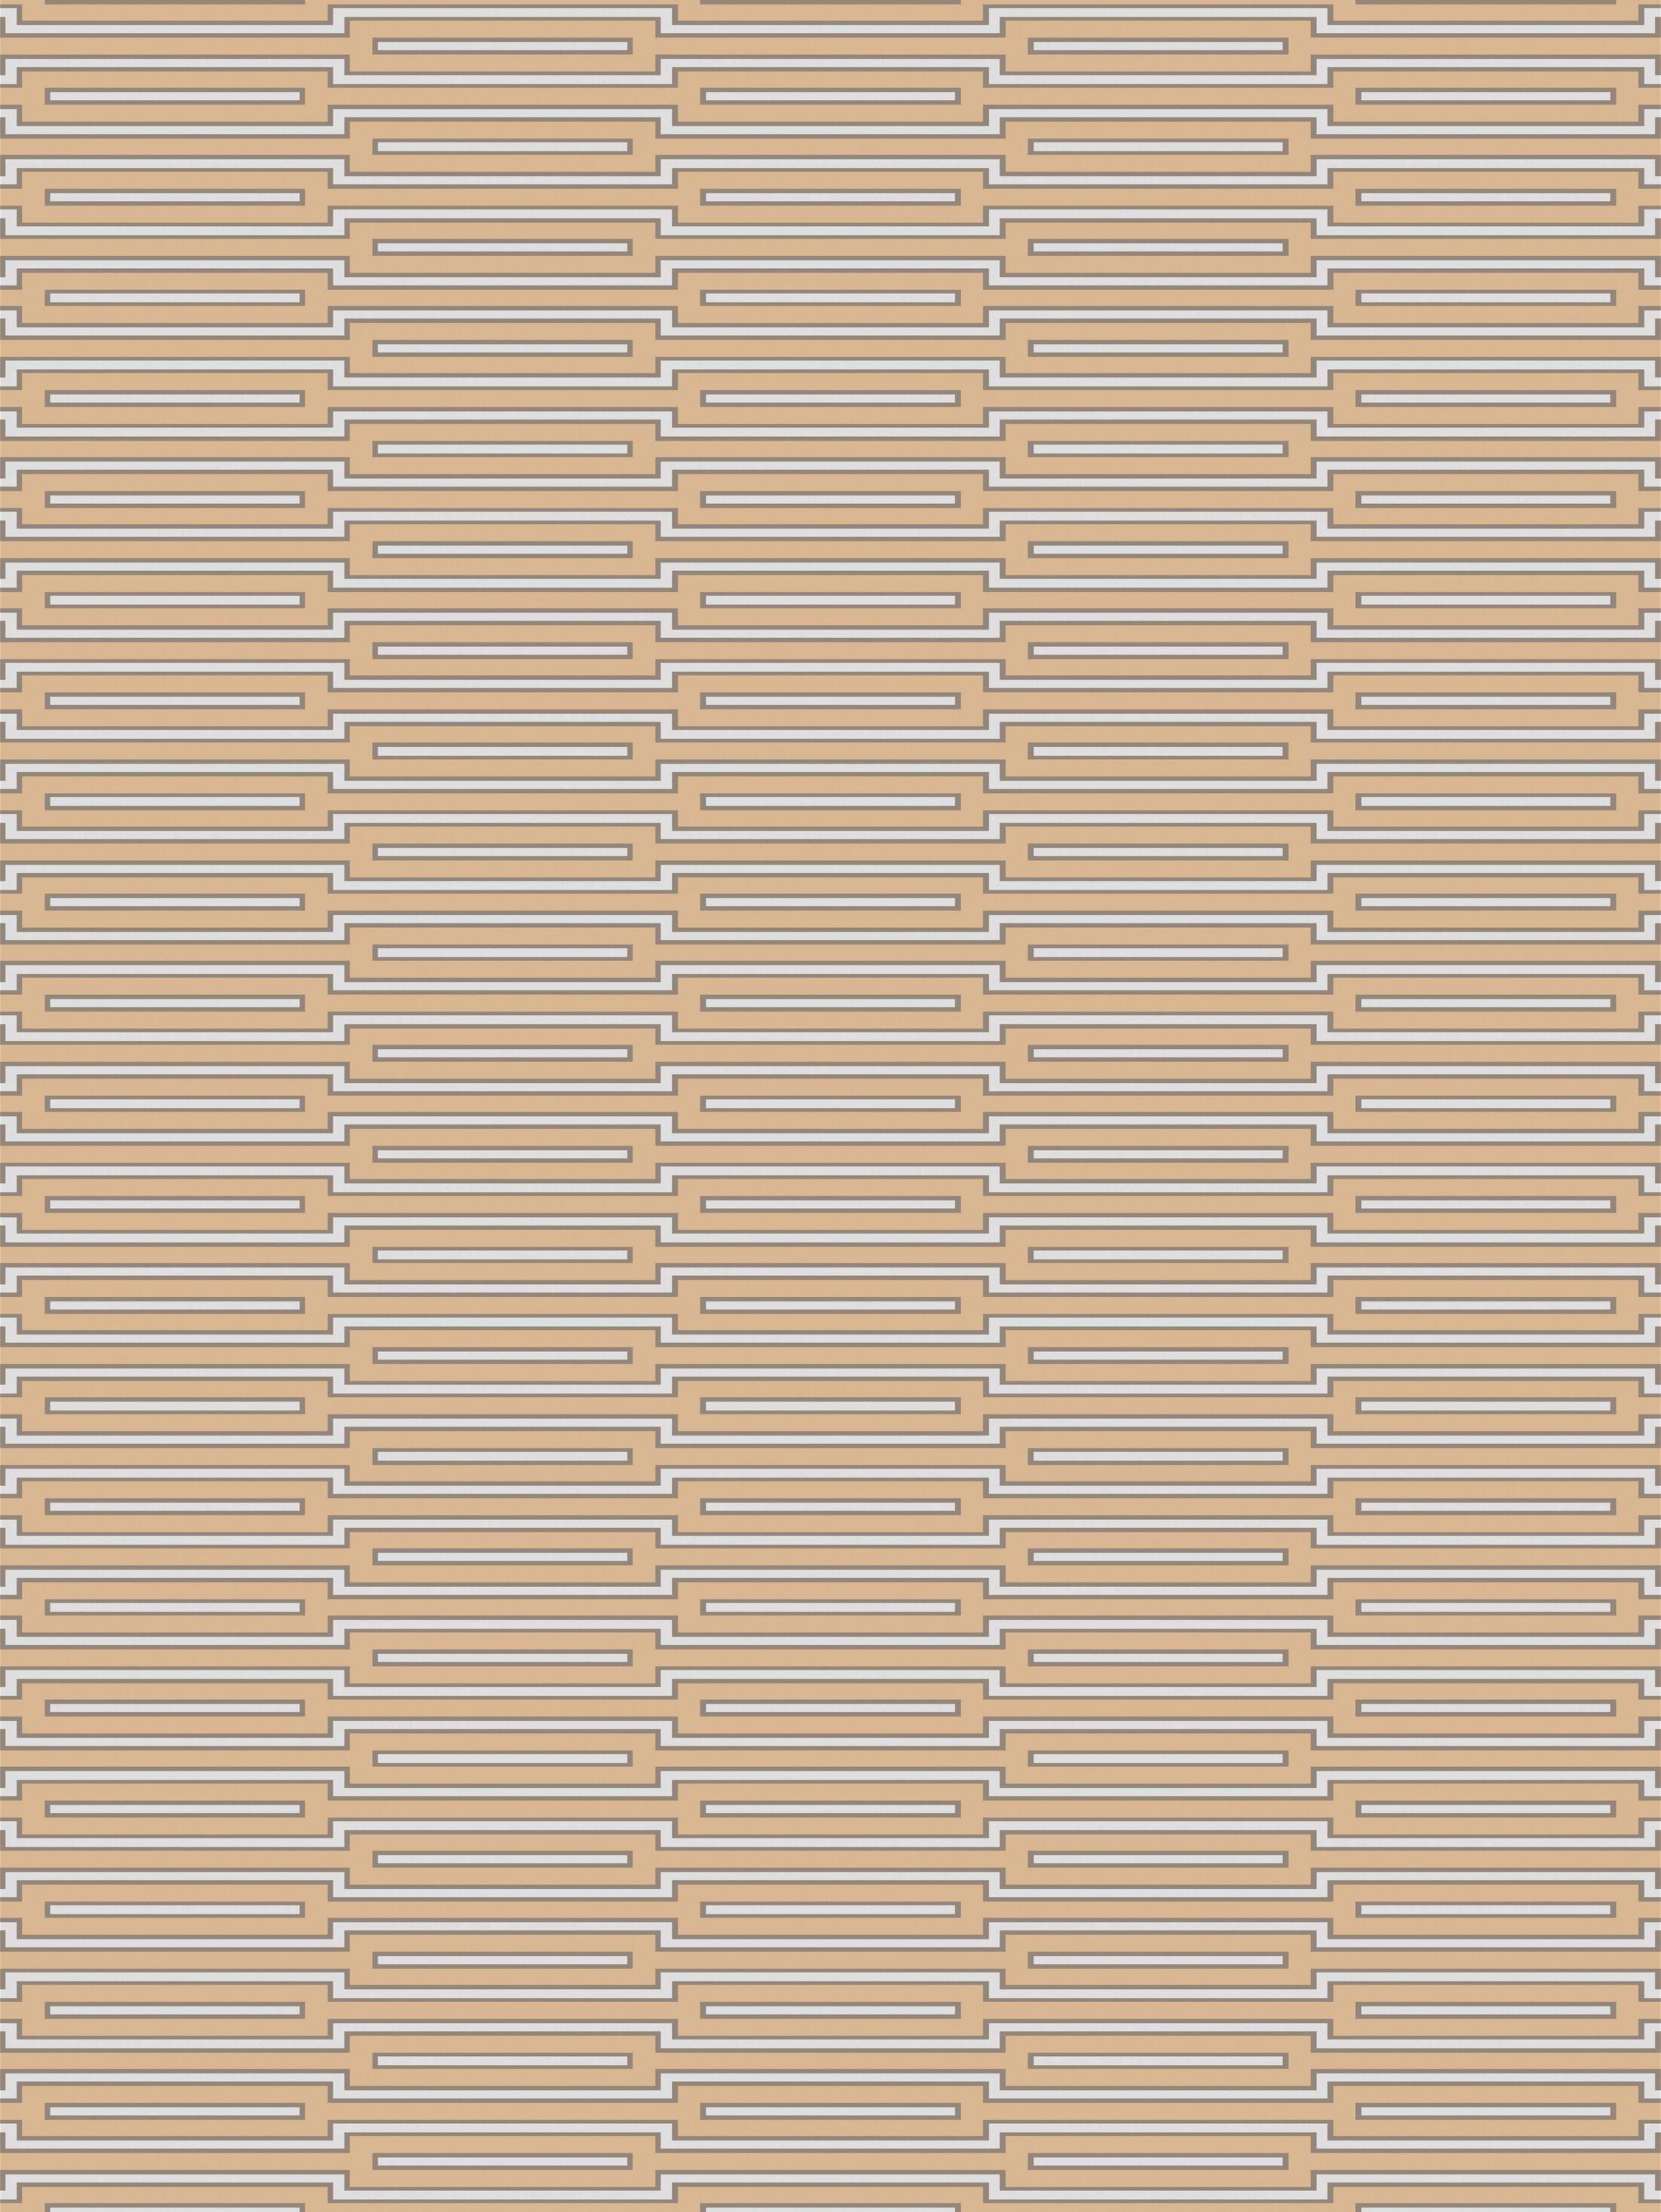 Montana Hand-Knotted Tan Area Rug Rug Size: Rectangle 5' x 8'